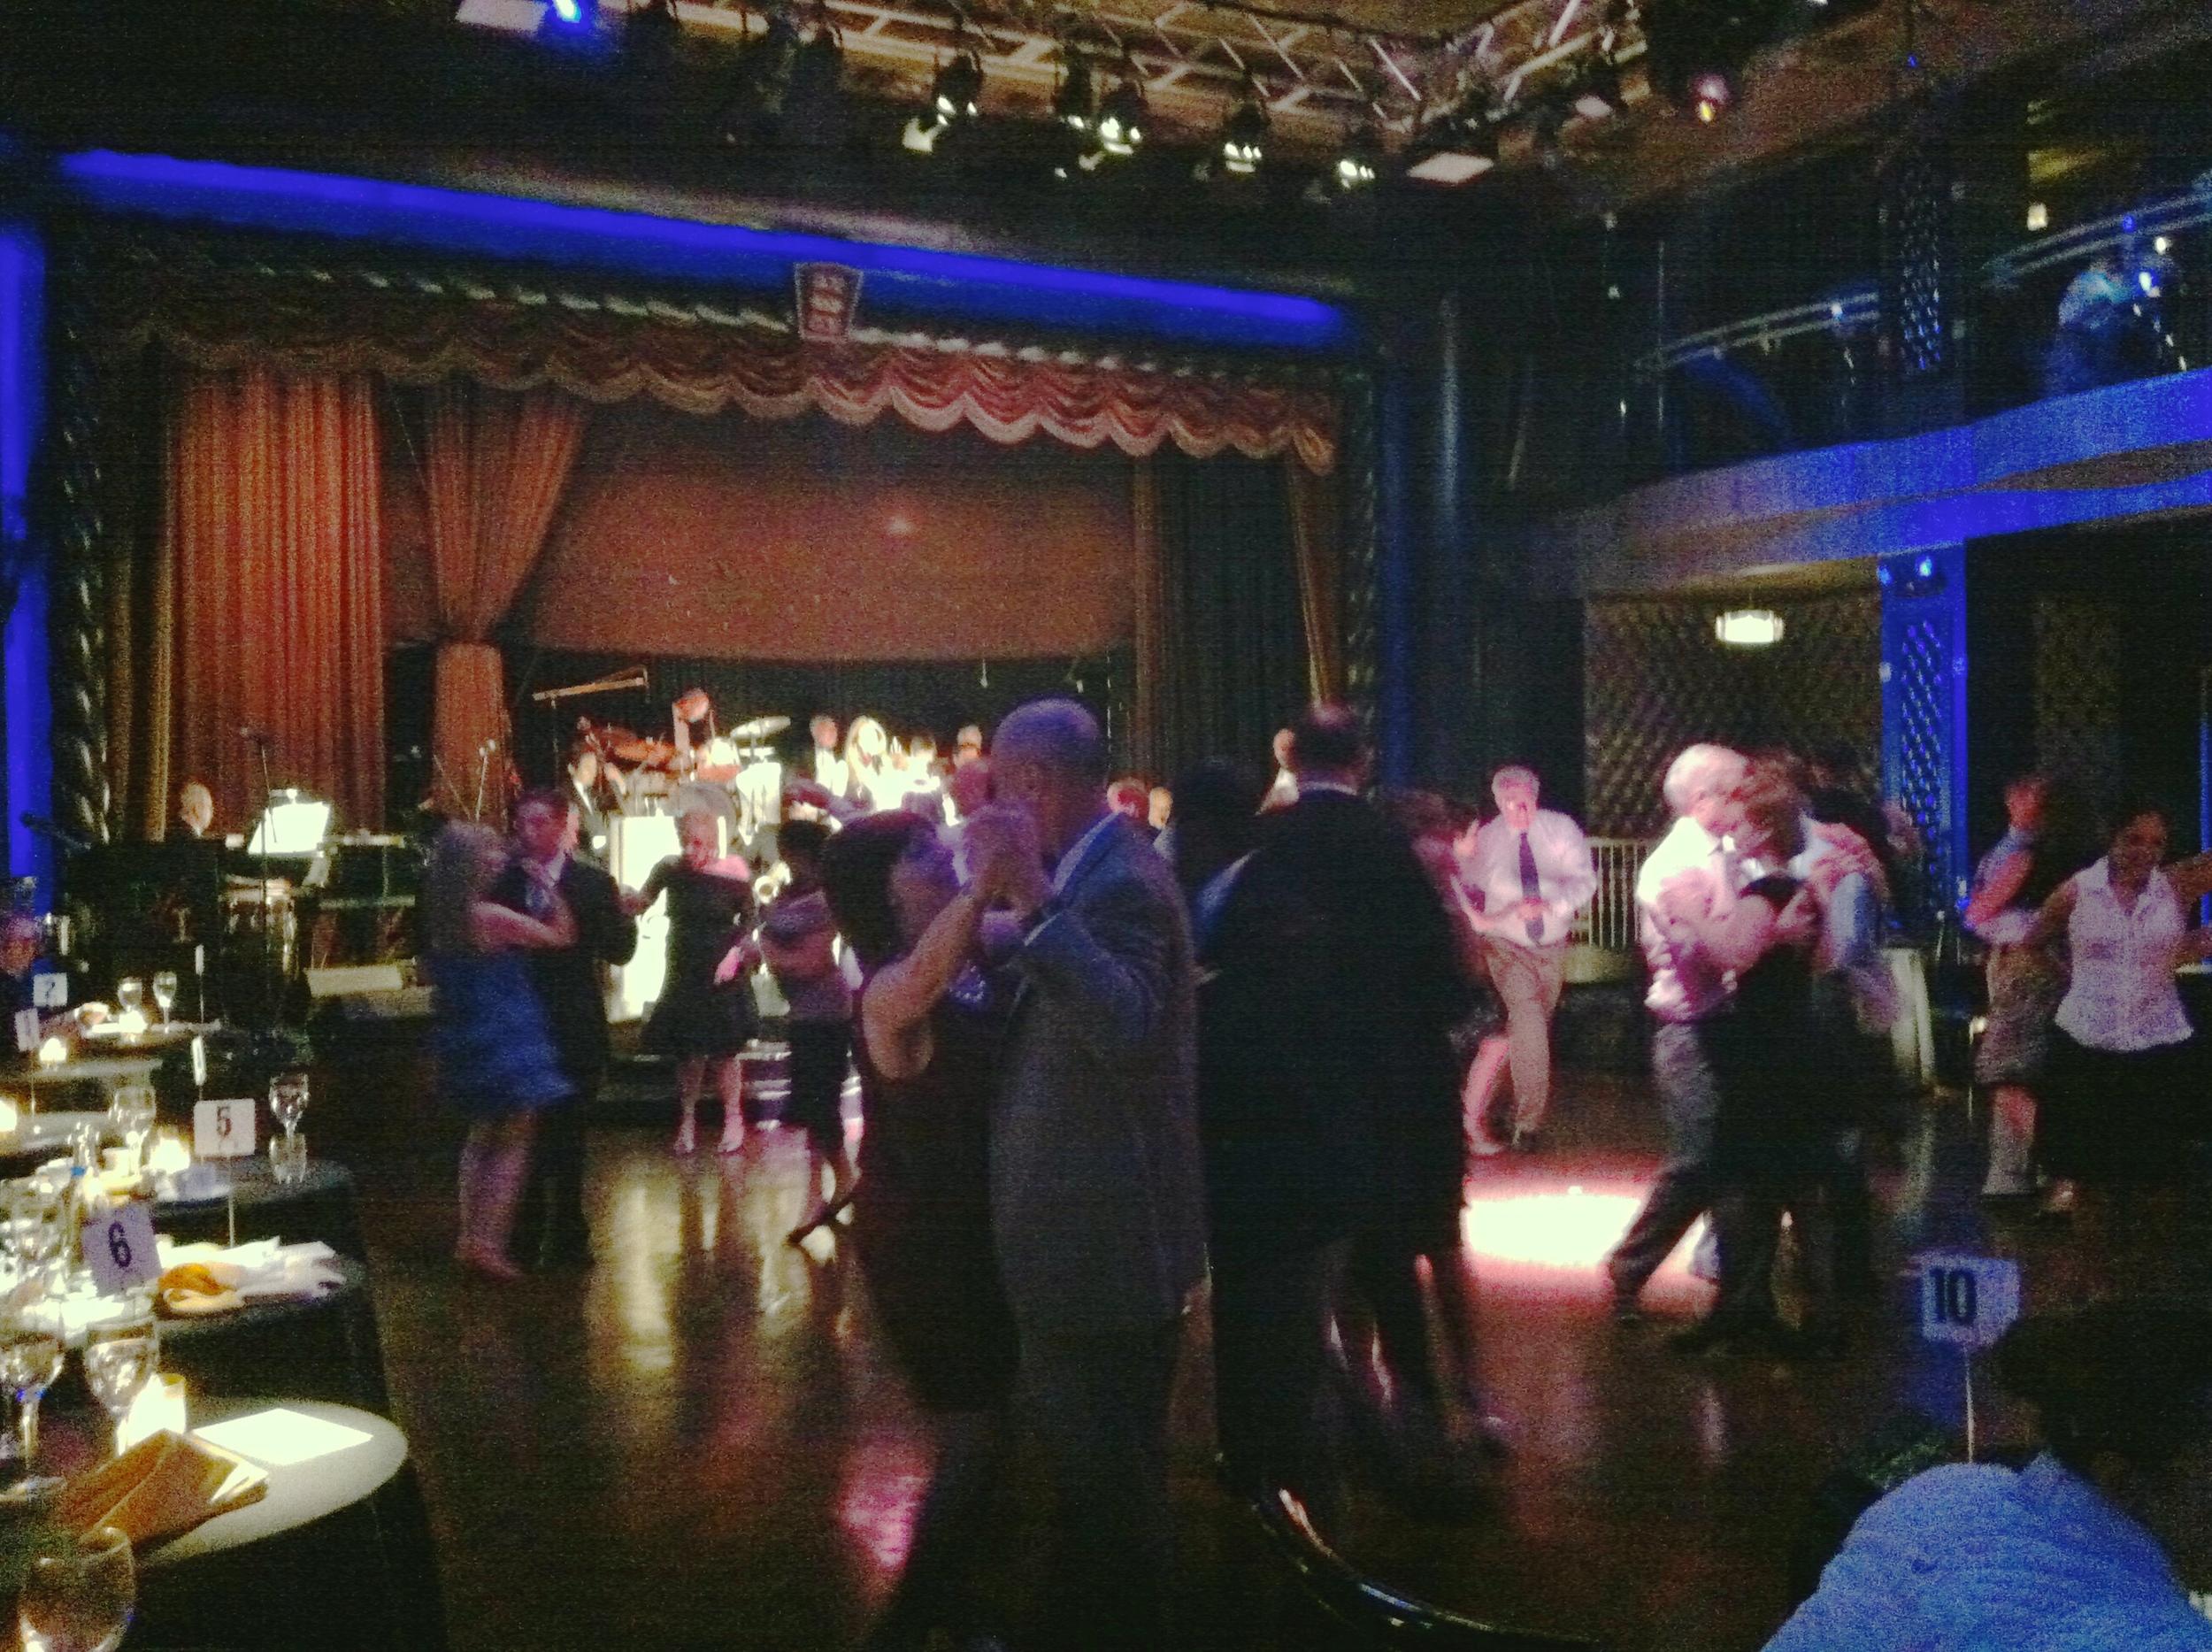 Social Dance in Edison Ballroom